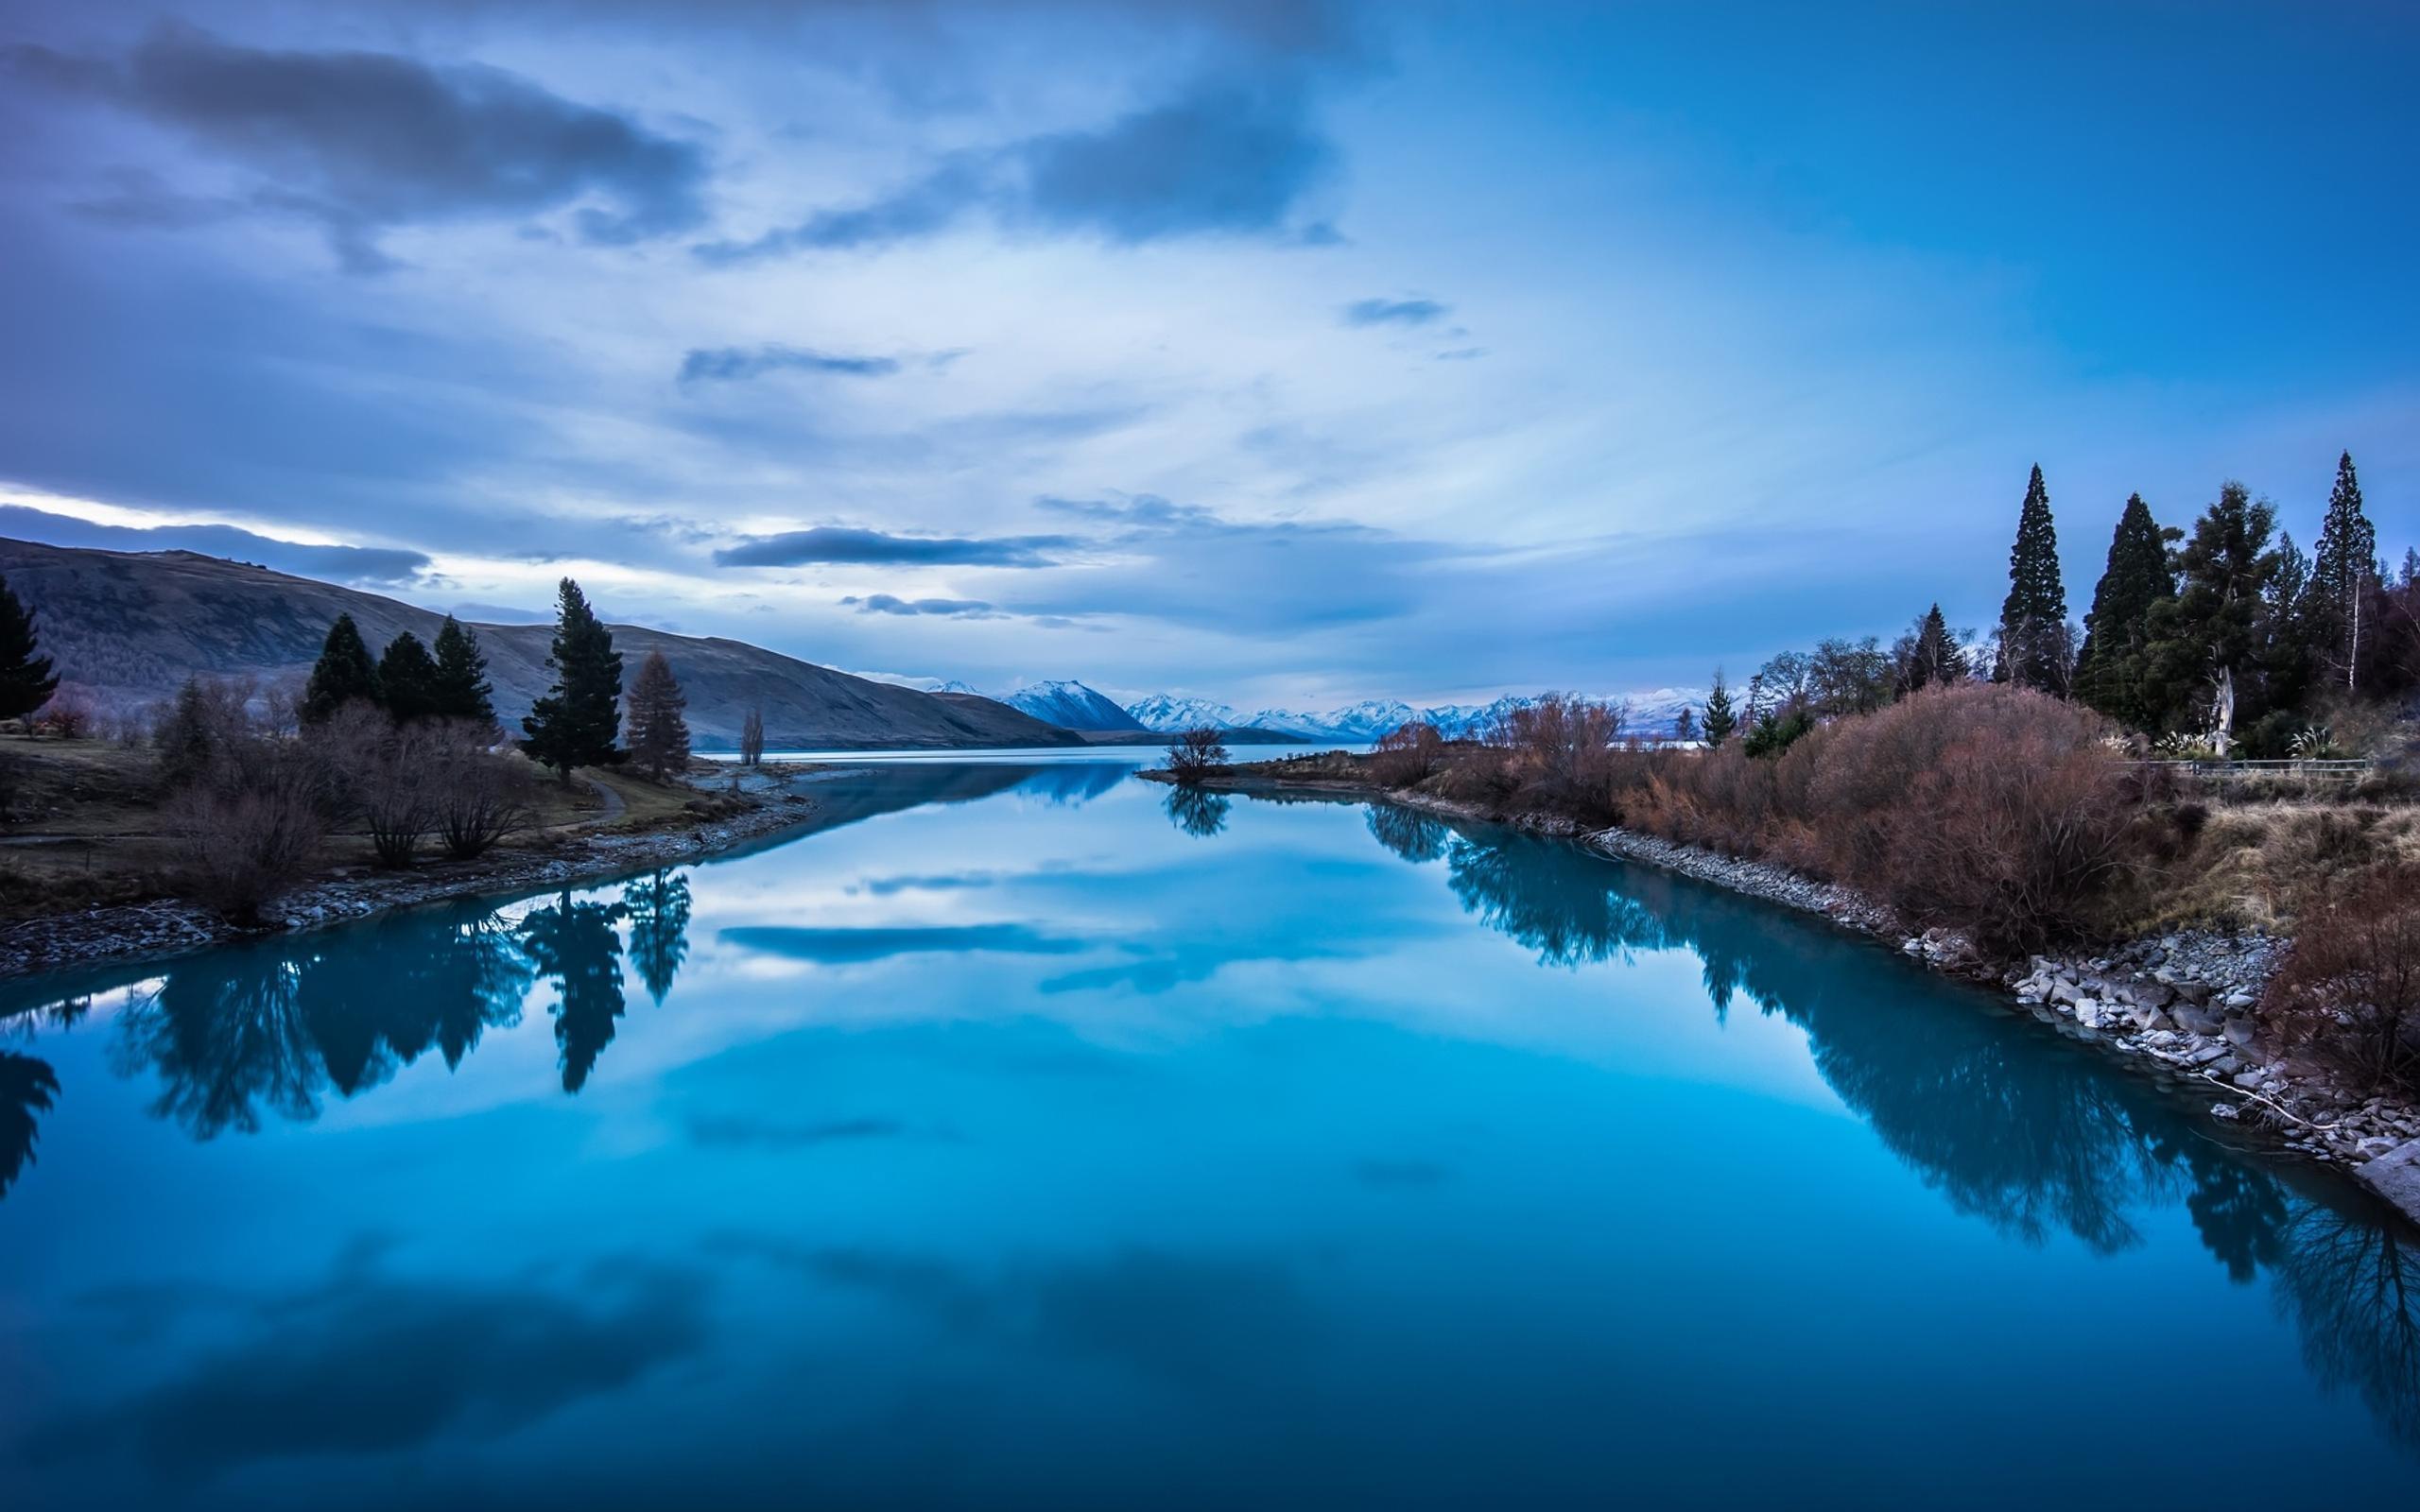 Nature in blue color hd wallpaper download 2560x1600 - Nature wallpaper 2560x1600 ...